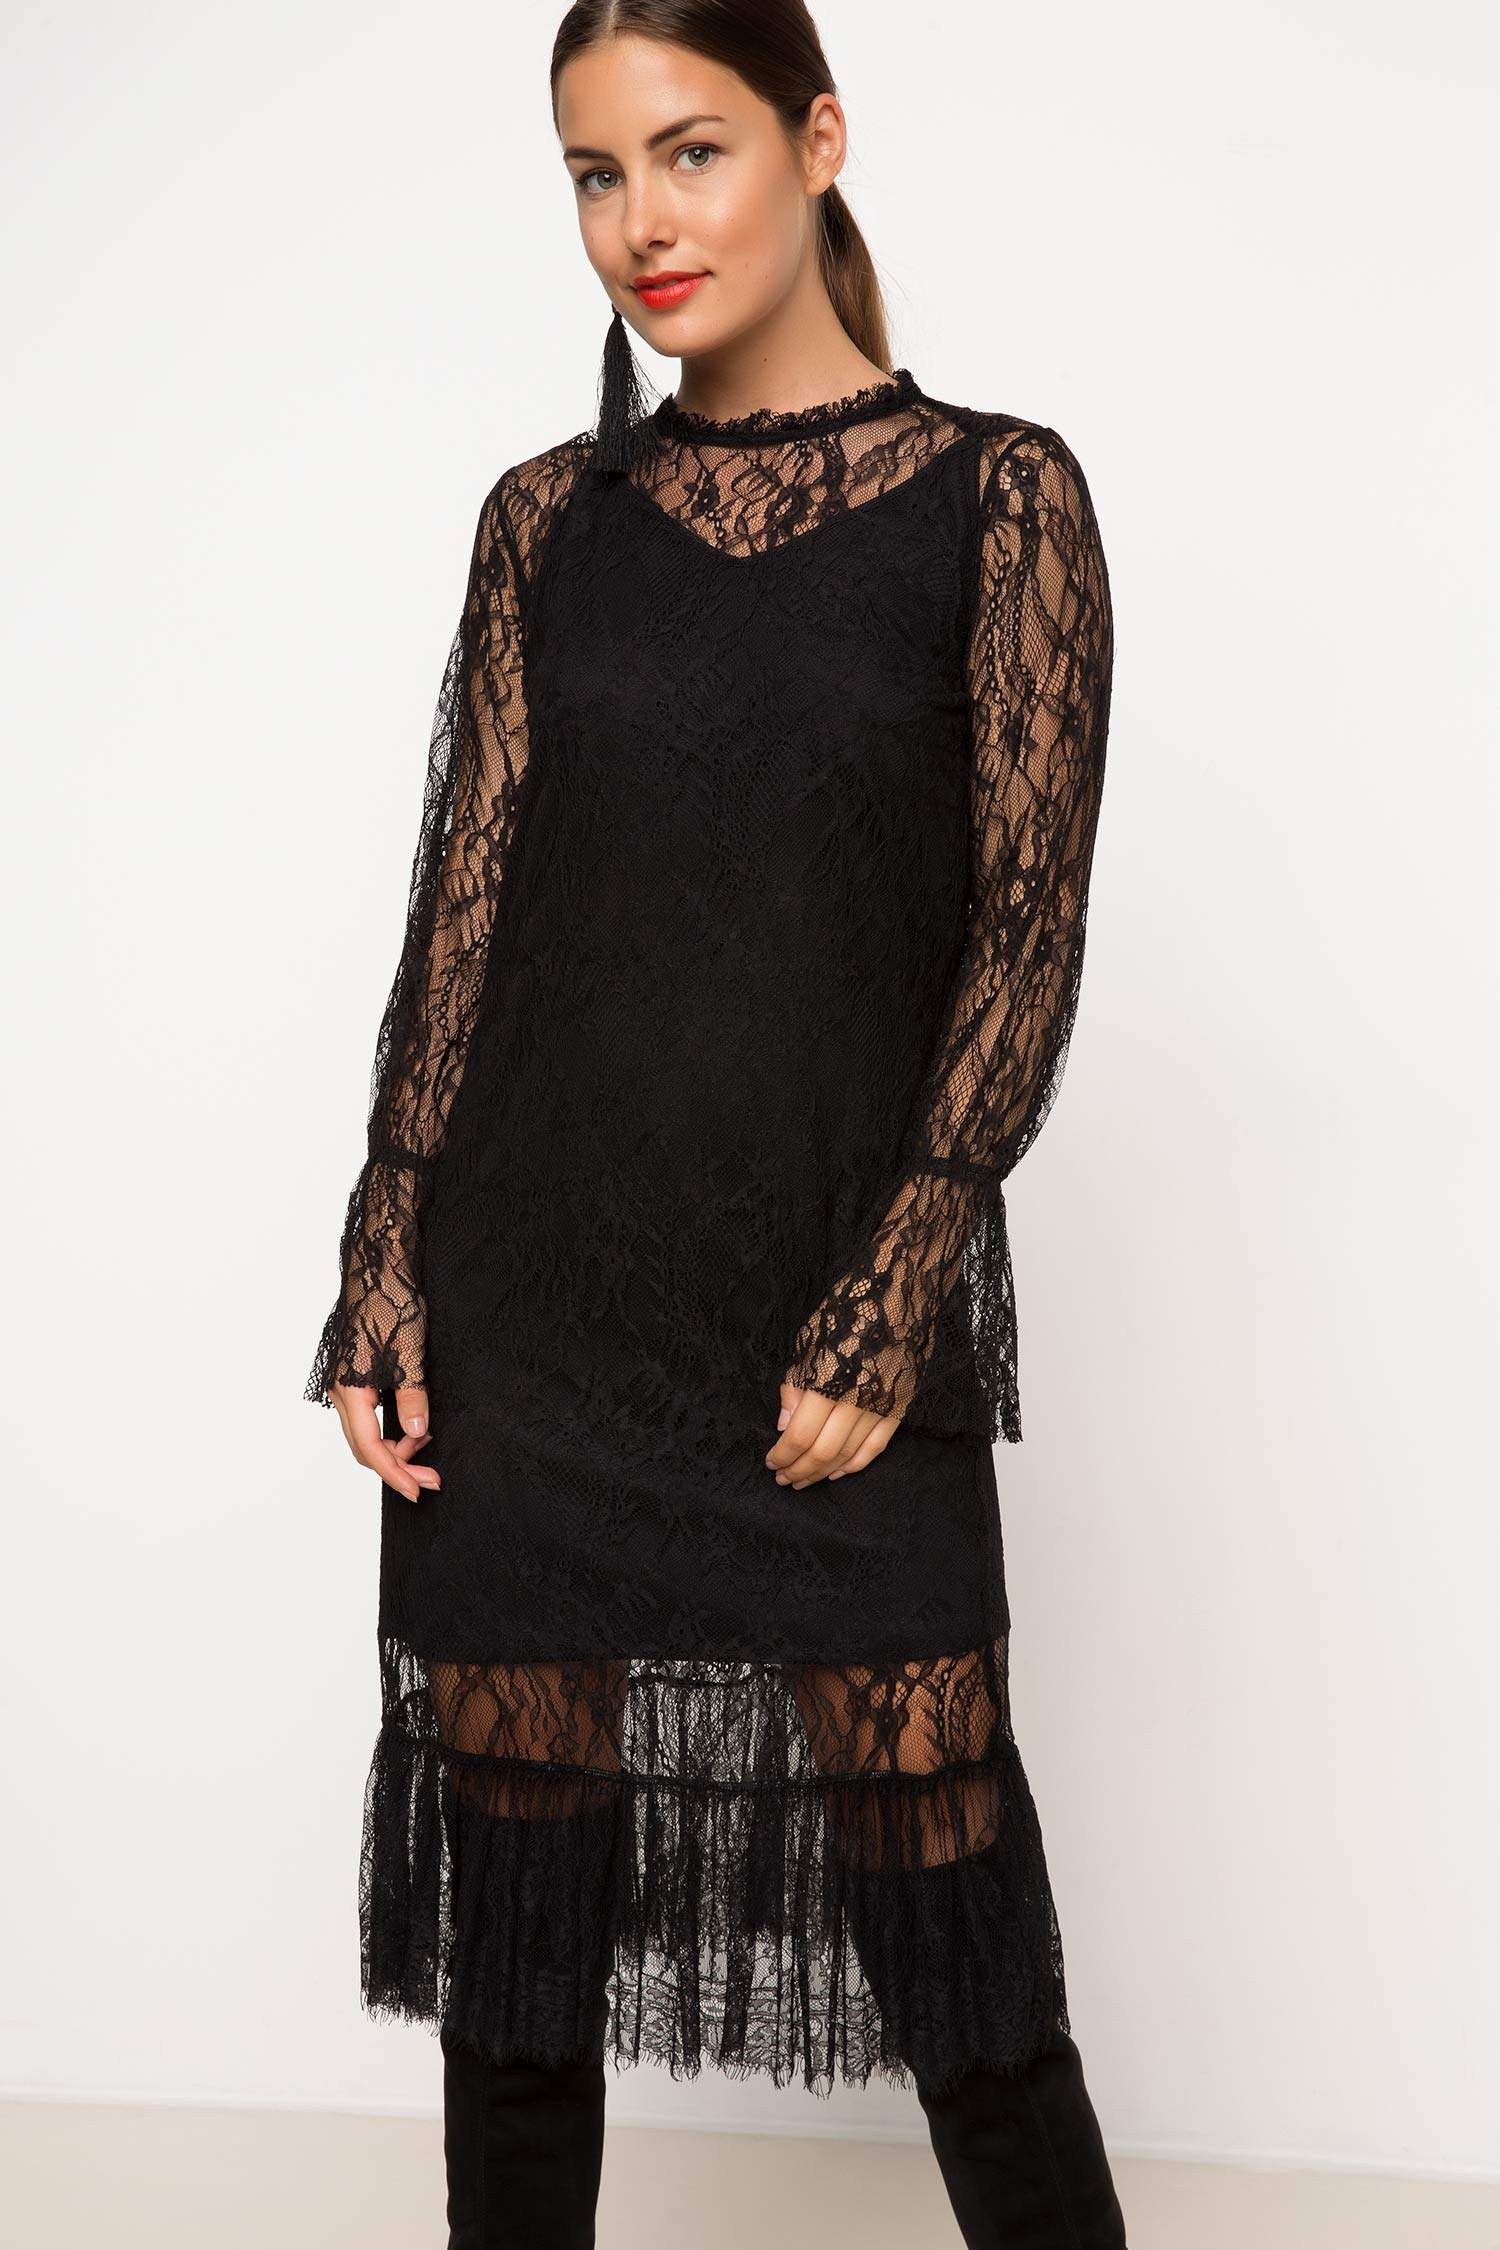 c0fd8a19cec9b Siyah Kadın Dantel Elbise 784171 | DeFacto